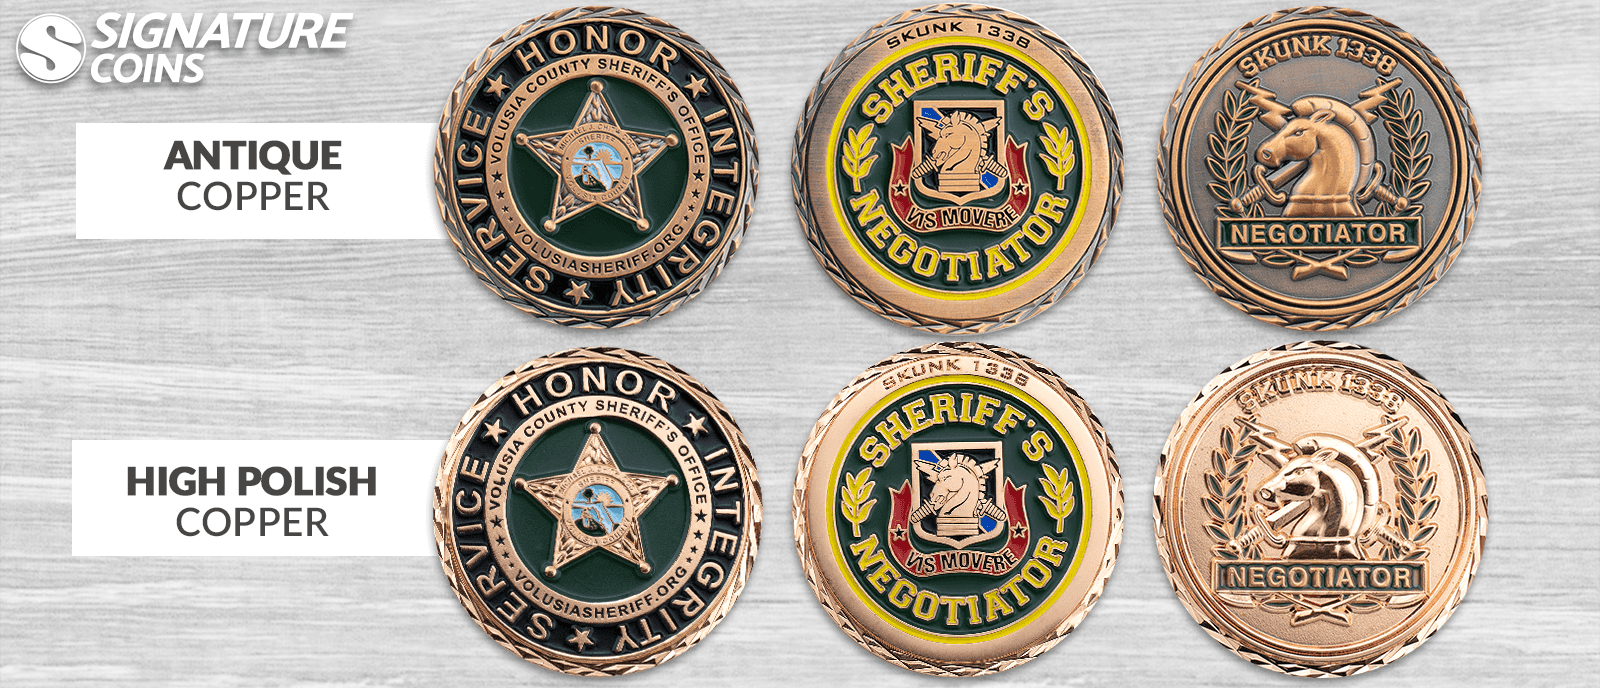 SignatureCoins-Law-Enforcement-Sheriff-negotiator